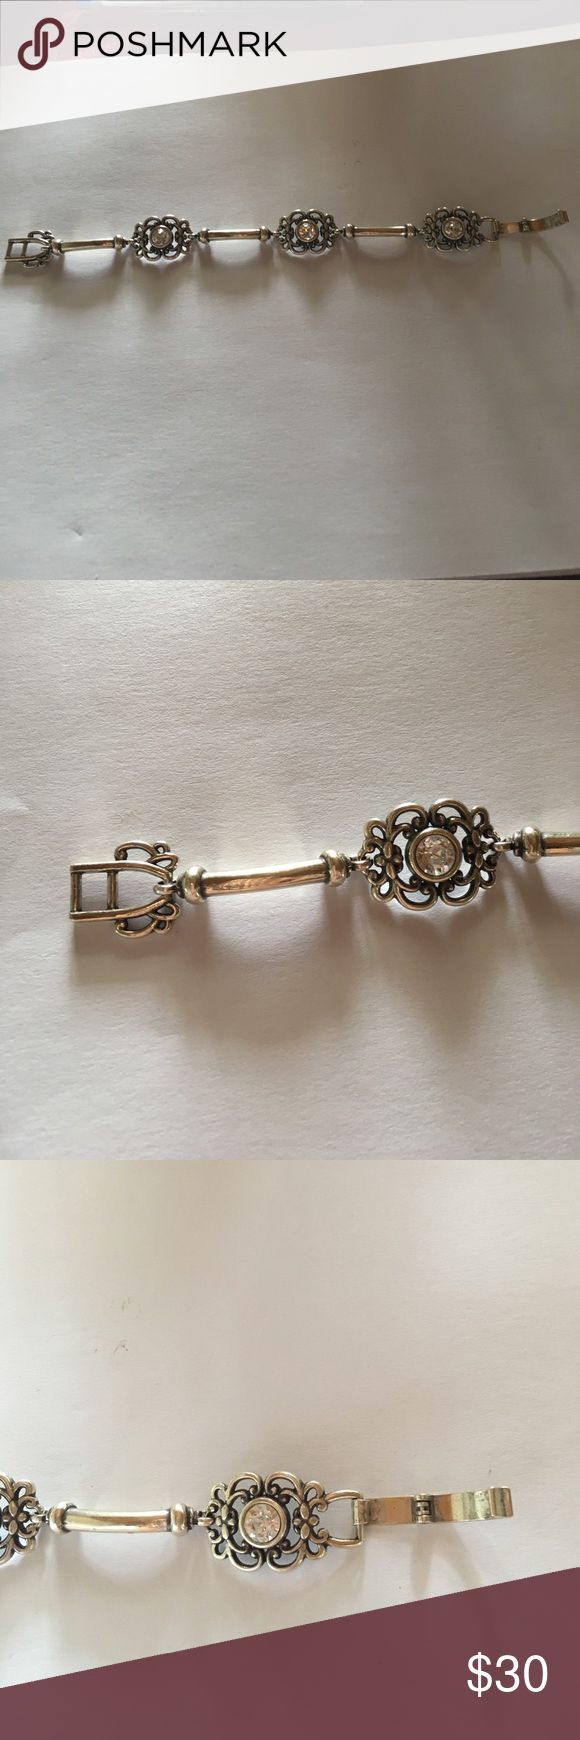 Brighton bracelet Brighton silver bracelet. Worn a few times. Brighton Jewelry Bracelets